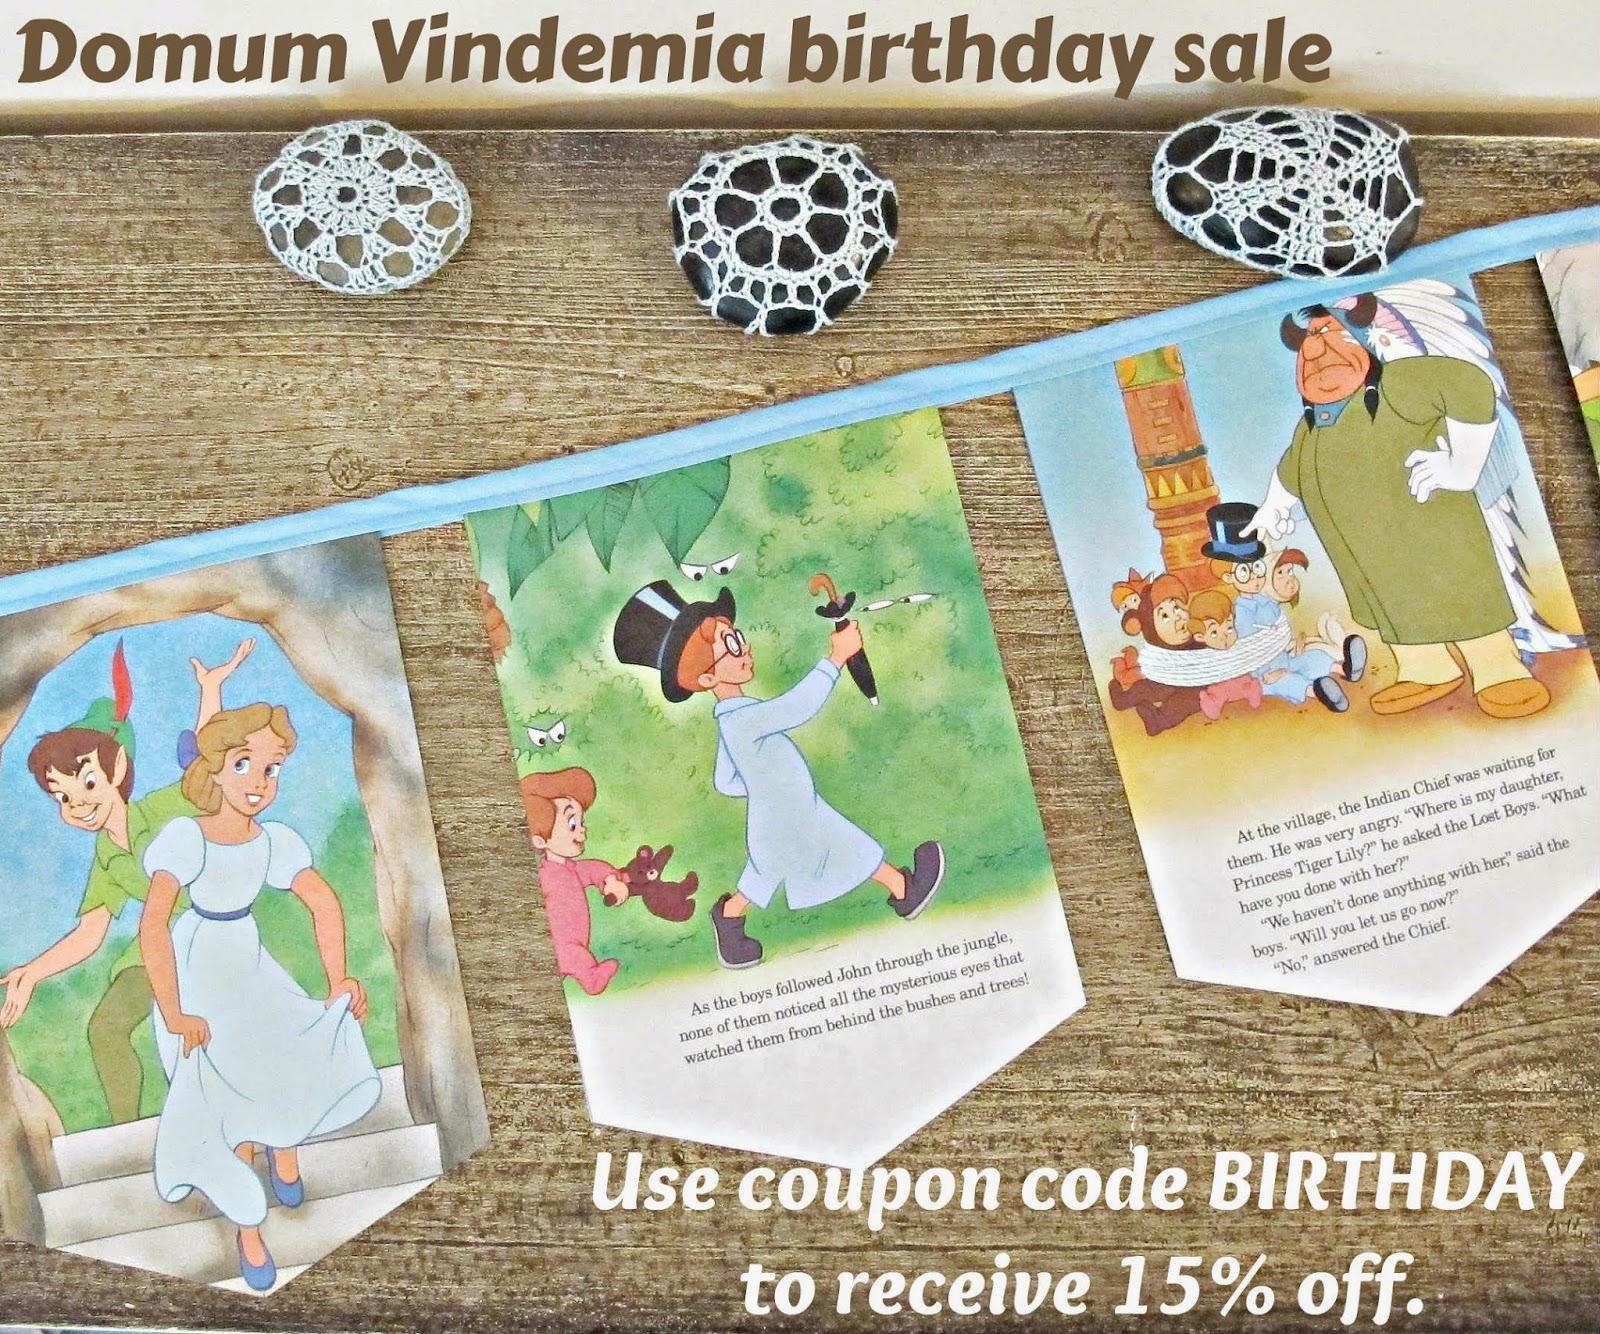 image domum vindemia birthday discount peter pan bunting